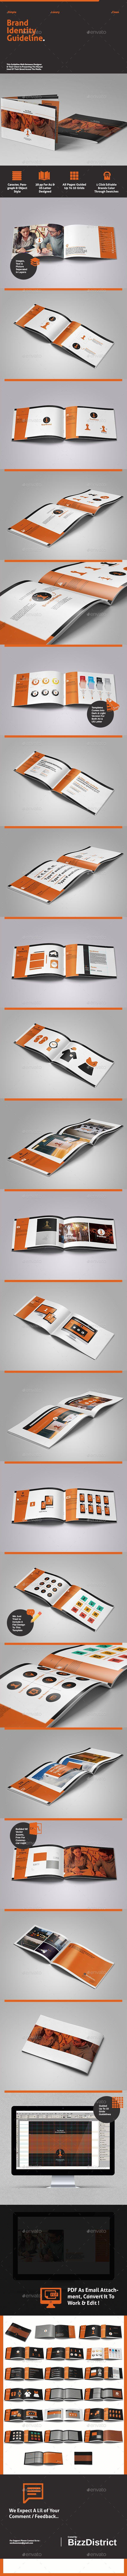 Brand Identity Guidelines - Informational Brochures - Designer Kit, please digest & check..